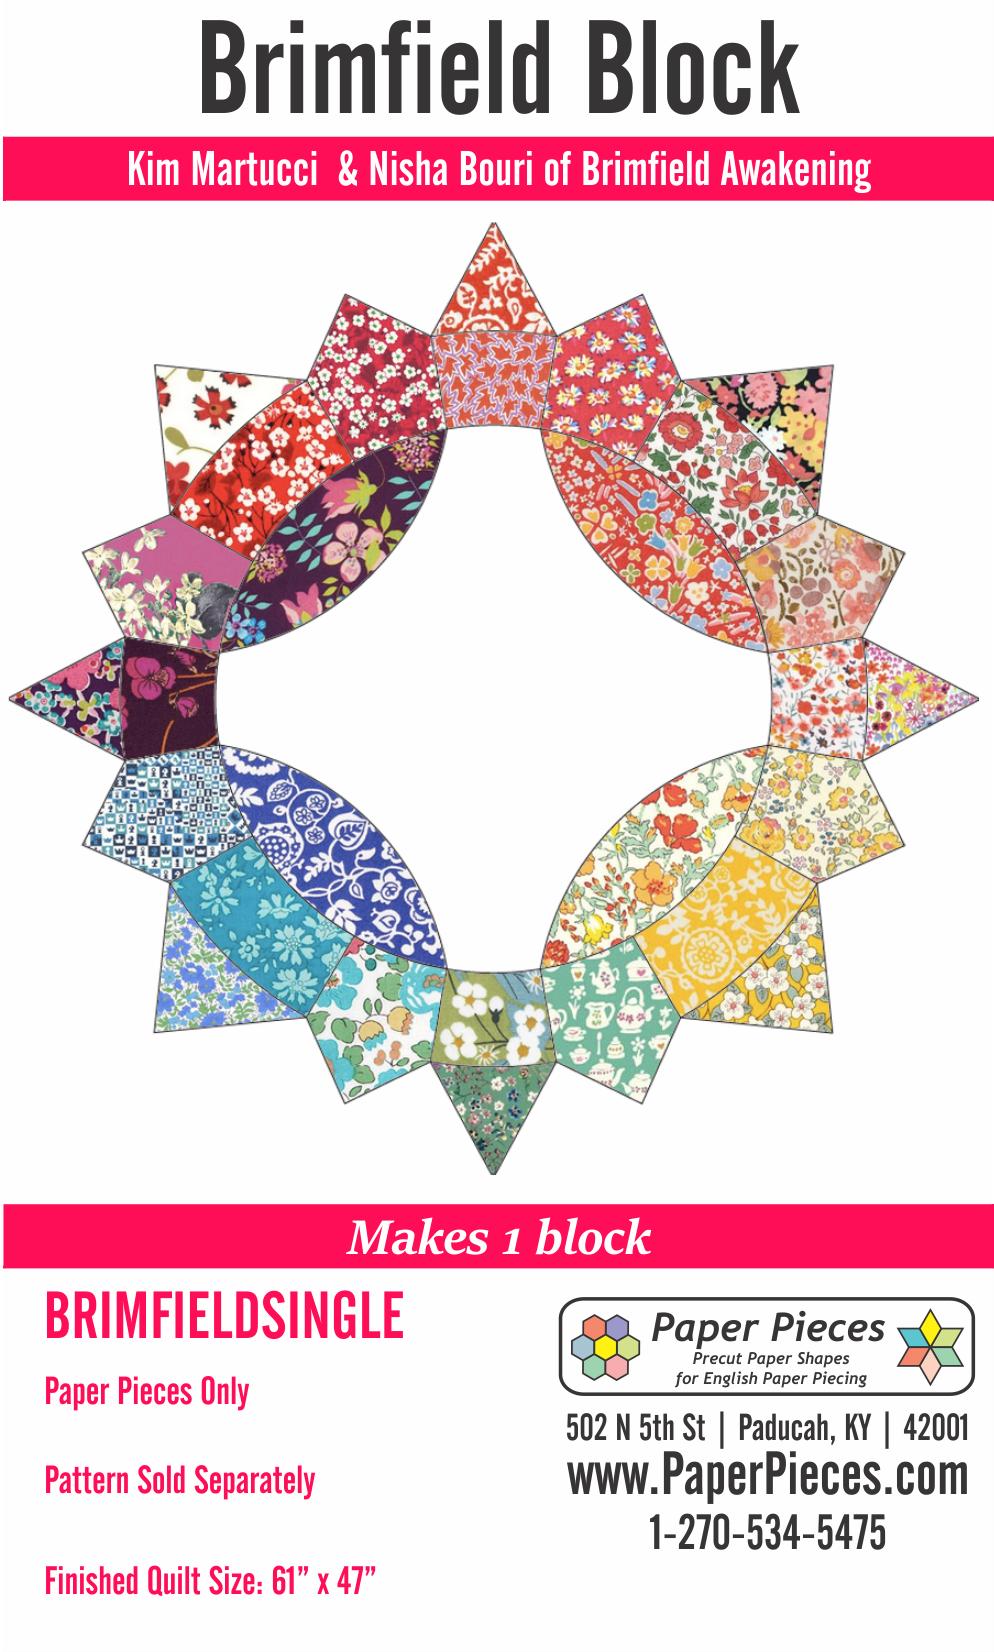 Brimfield Block Makes 1 Block